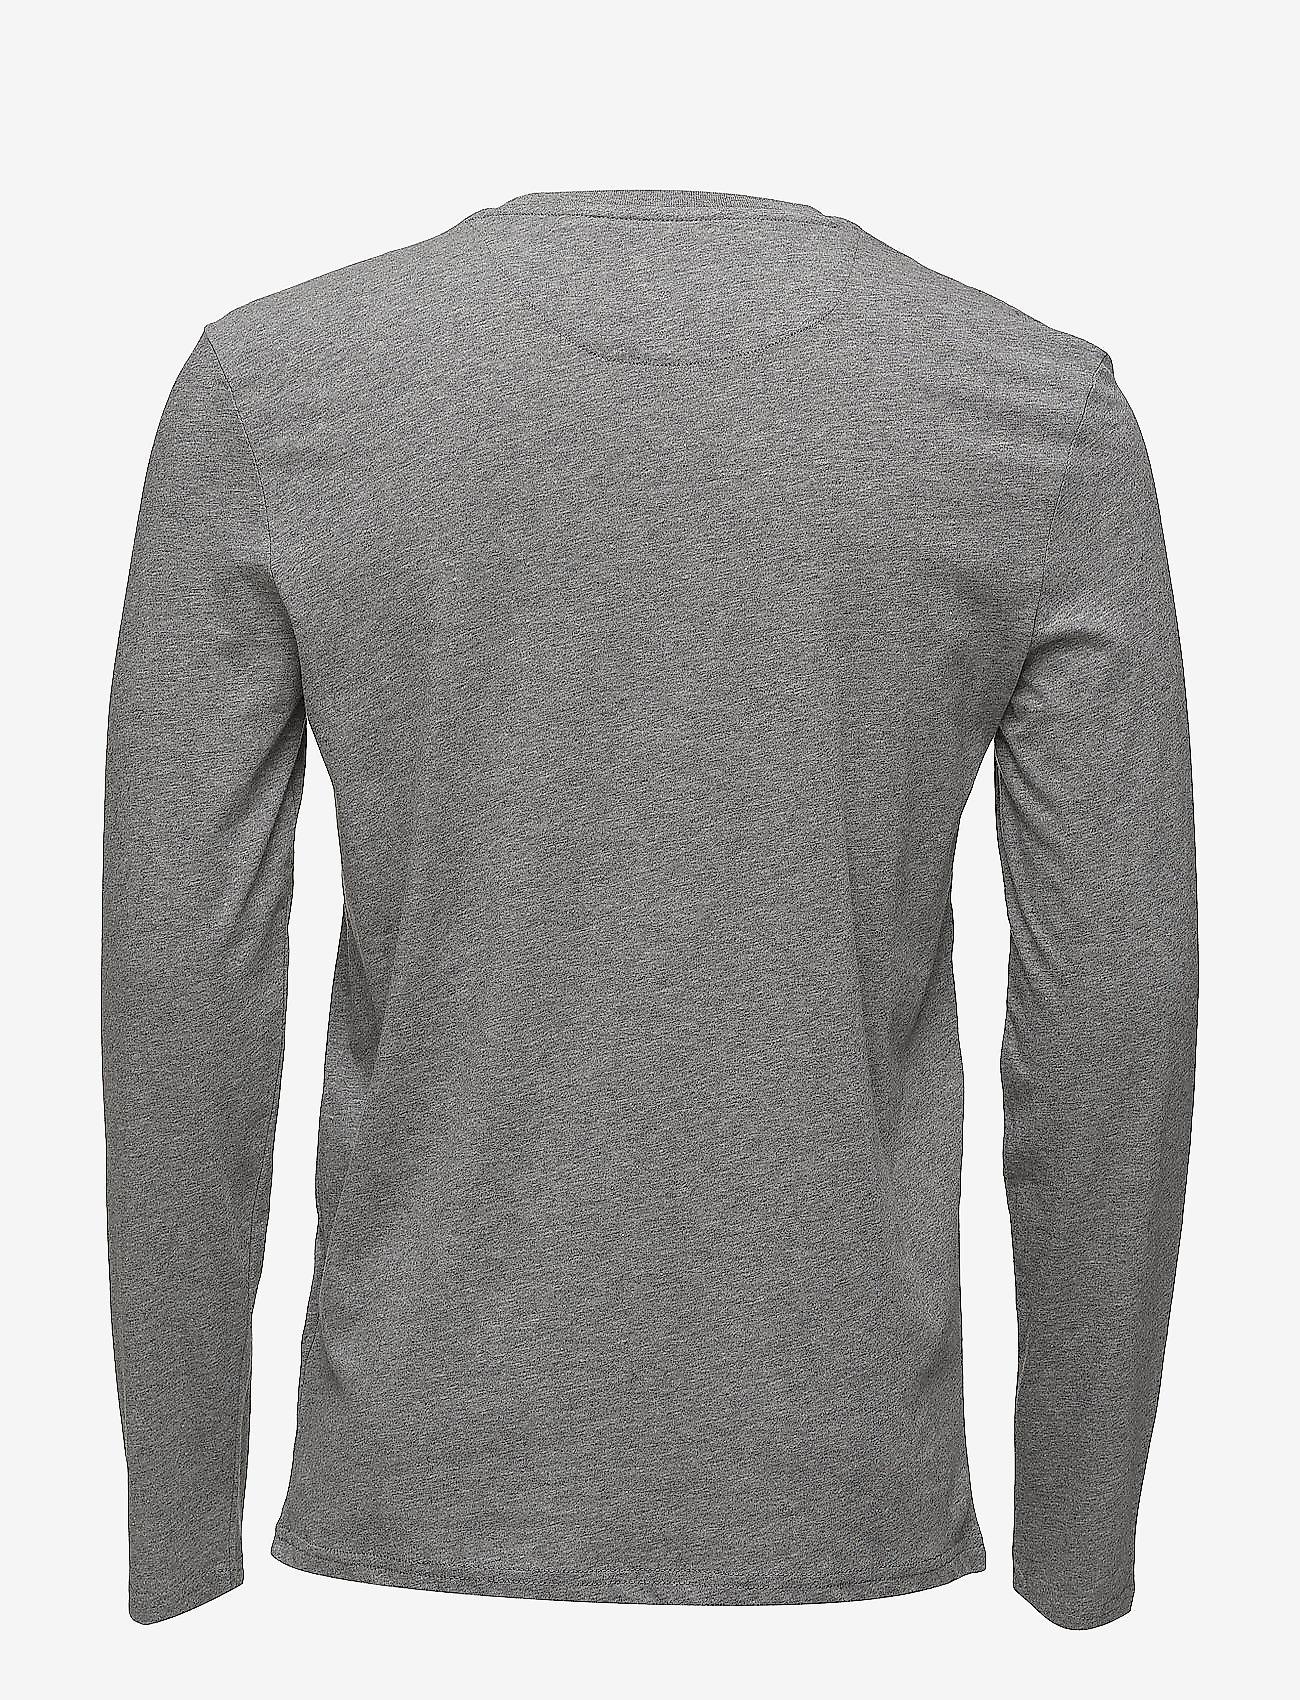 Lyle & Scott LS Crew Neck T-shirt - T-skjorter MID GREY MARL - Menn Klær